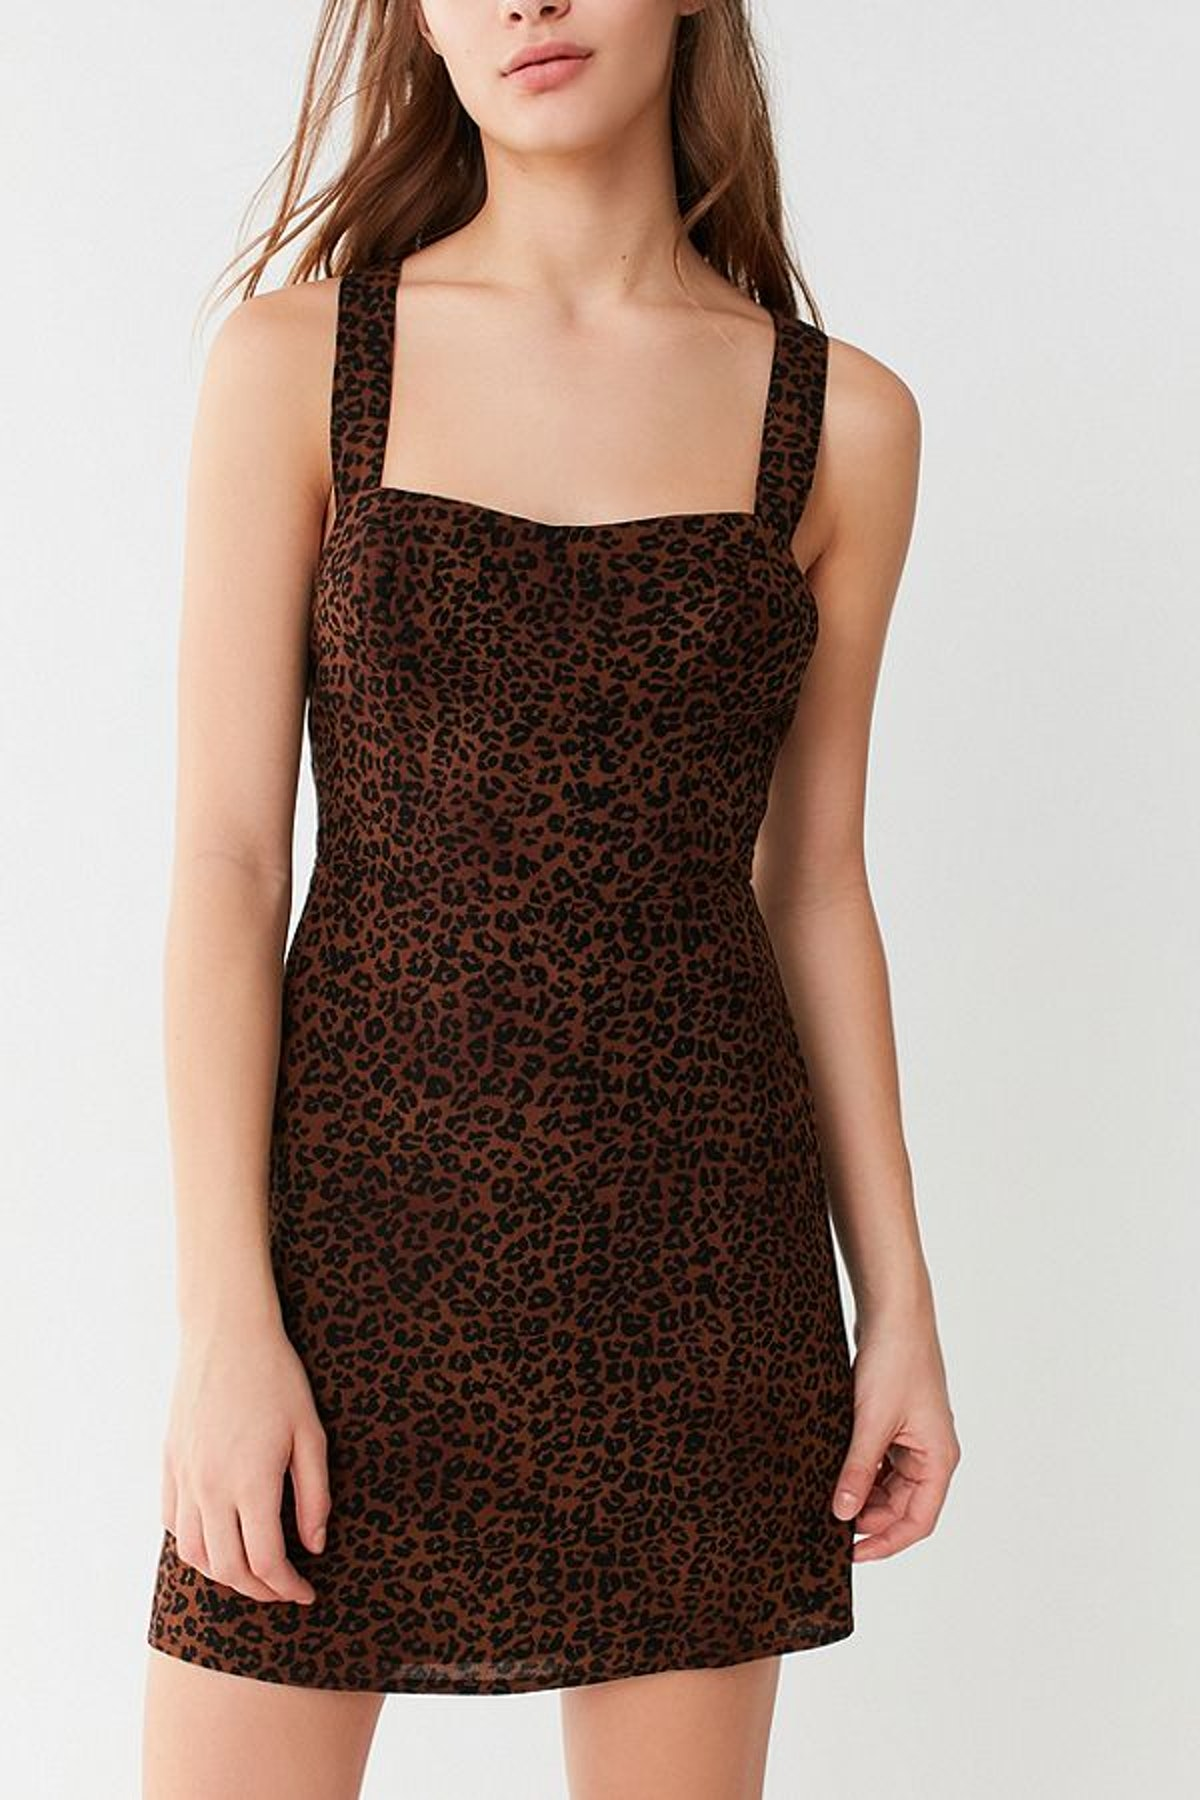 Animal Print Cross-Back Mini Dress UO Animal Print Cross-Back Mini Dress